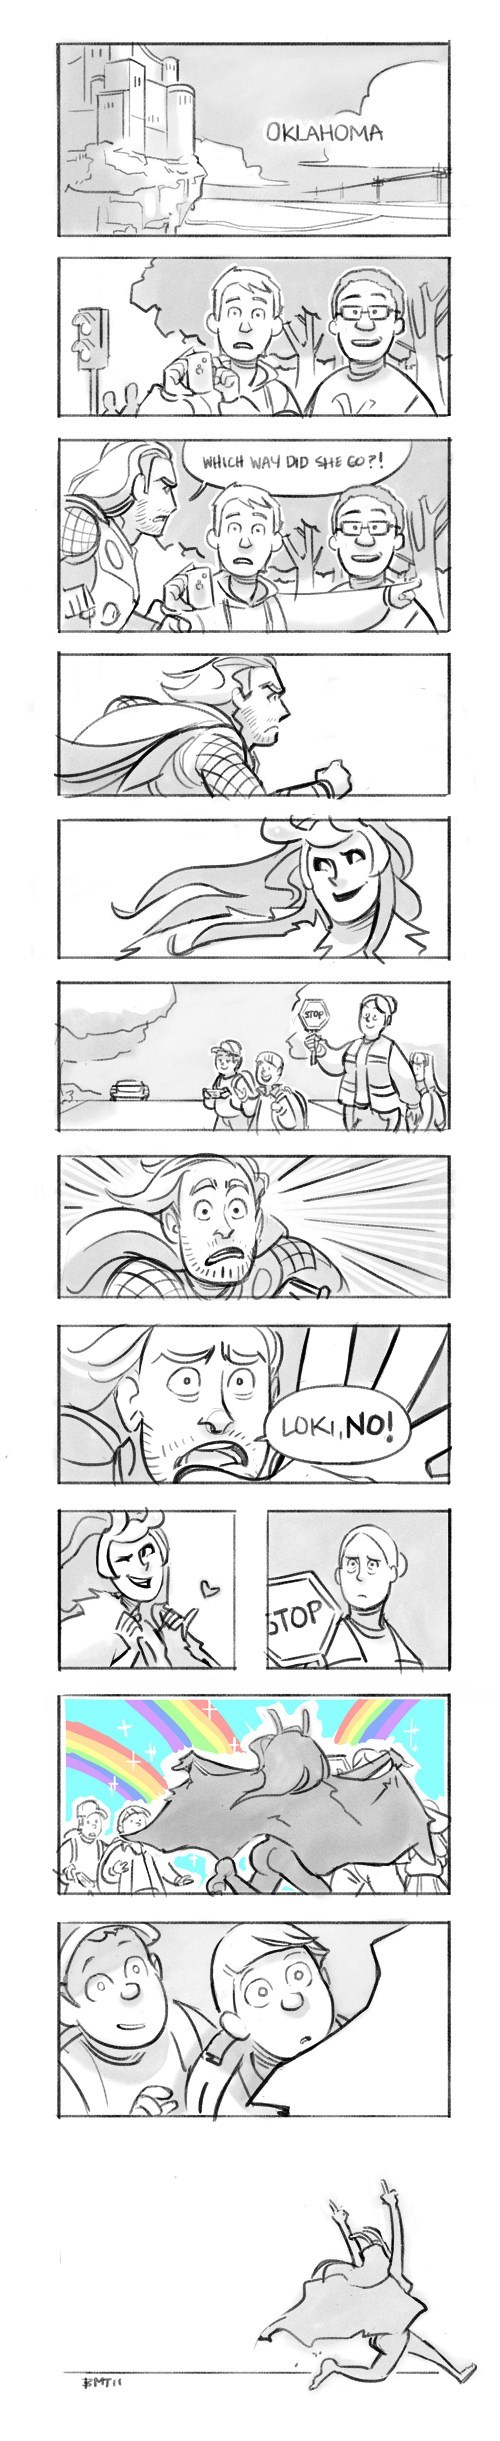 loki Thor comic sexy - 6884391168